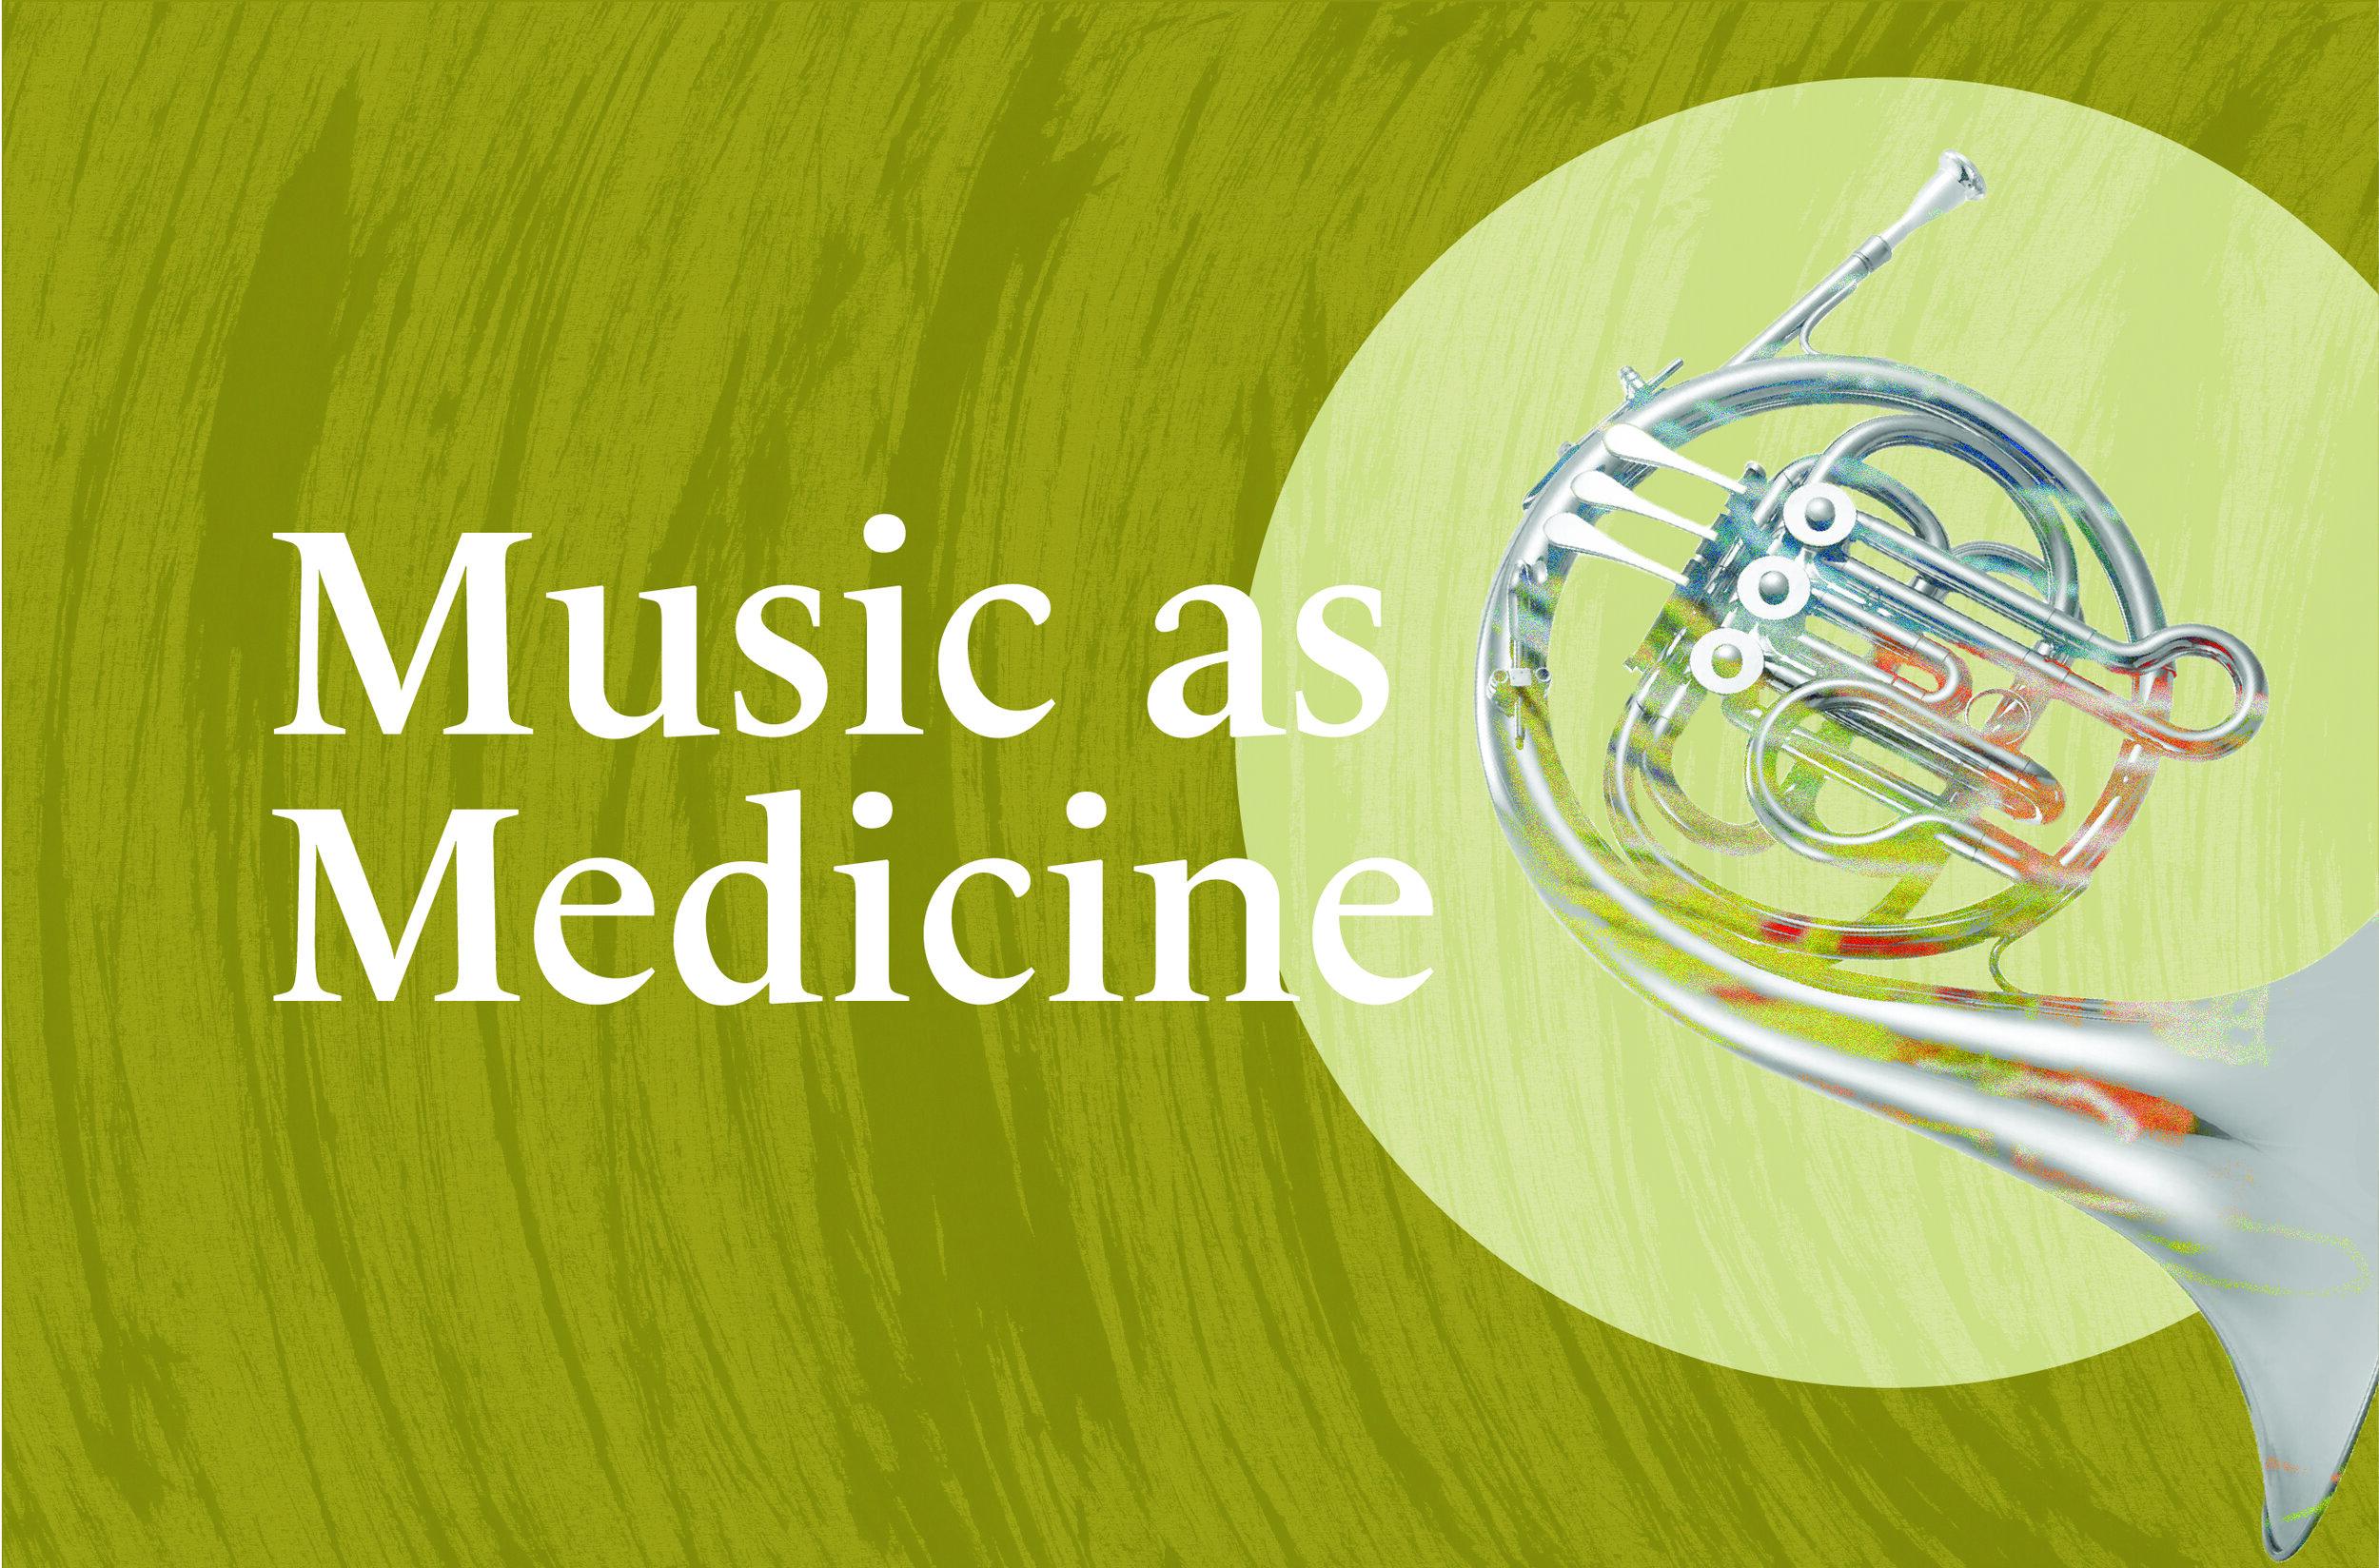 1137.1_OCMS_SeasonWebGraphics_V1_MusicAsMedicine-02-02.jpg